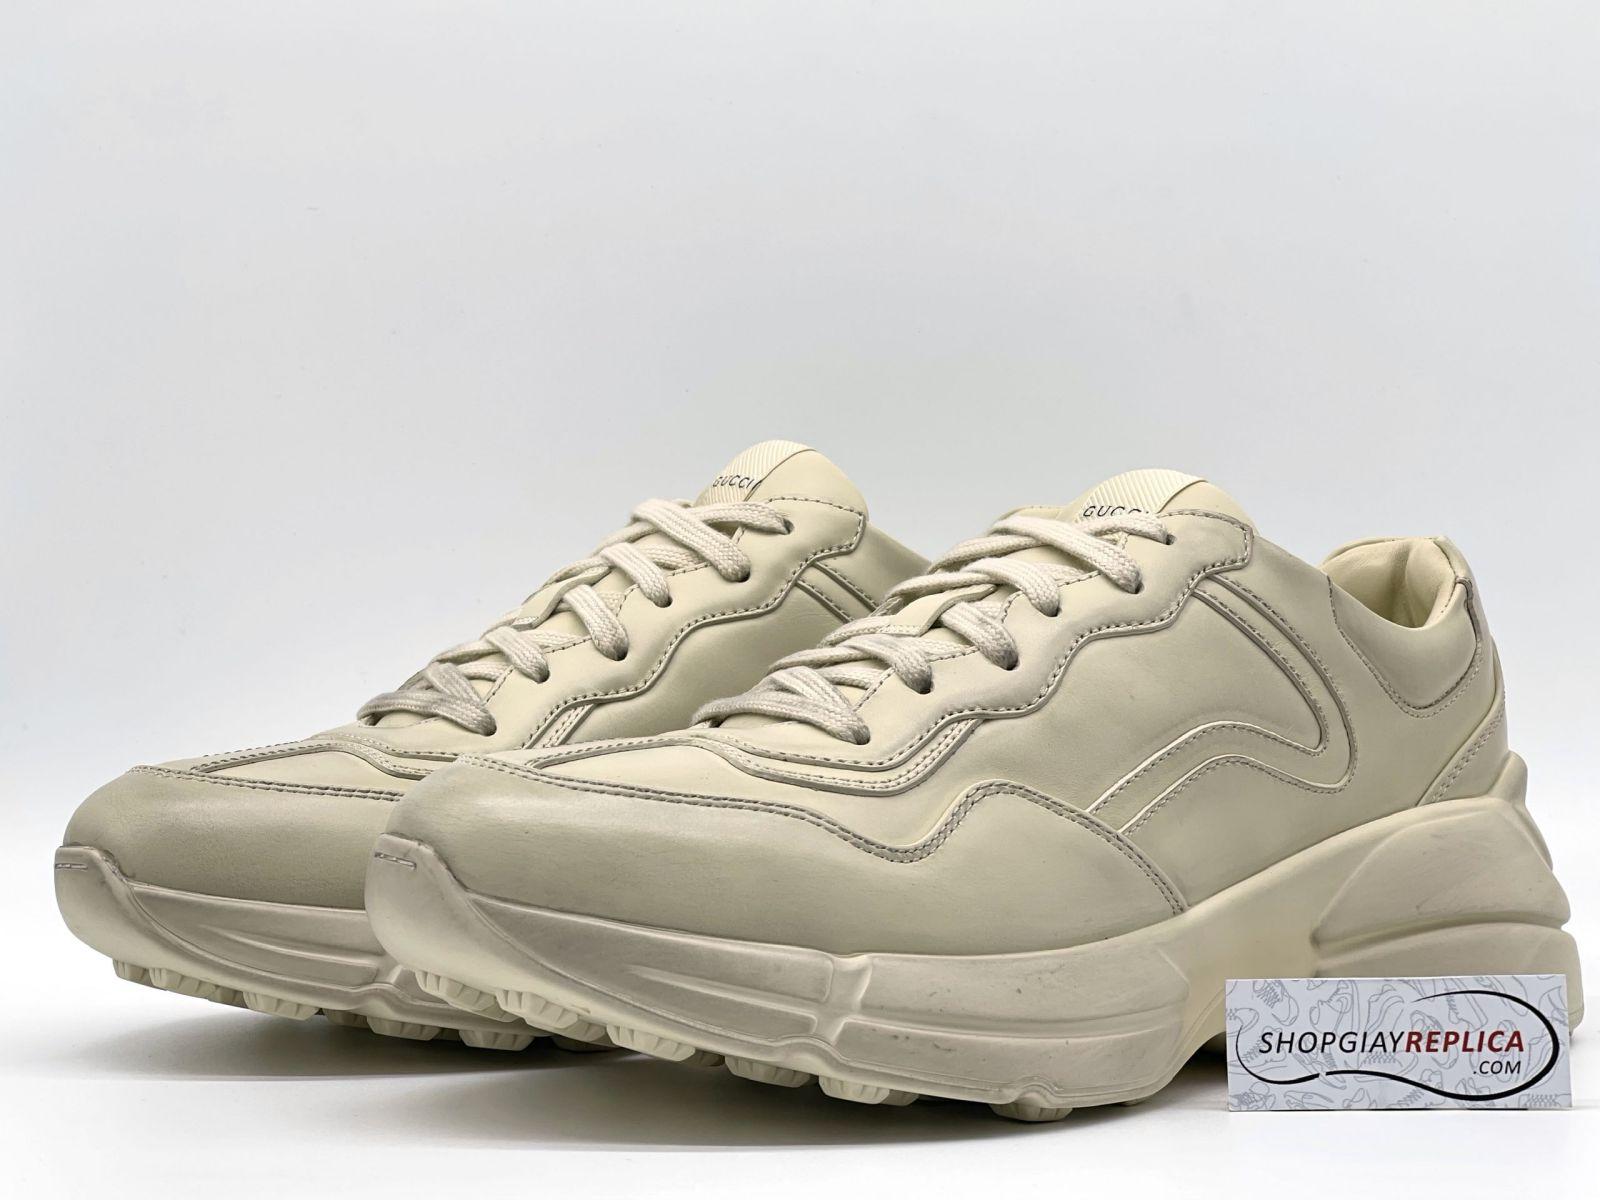 Giày Gucci Rhyton Leather Sneaker da trơn